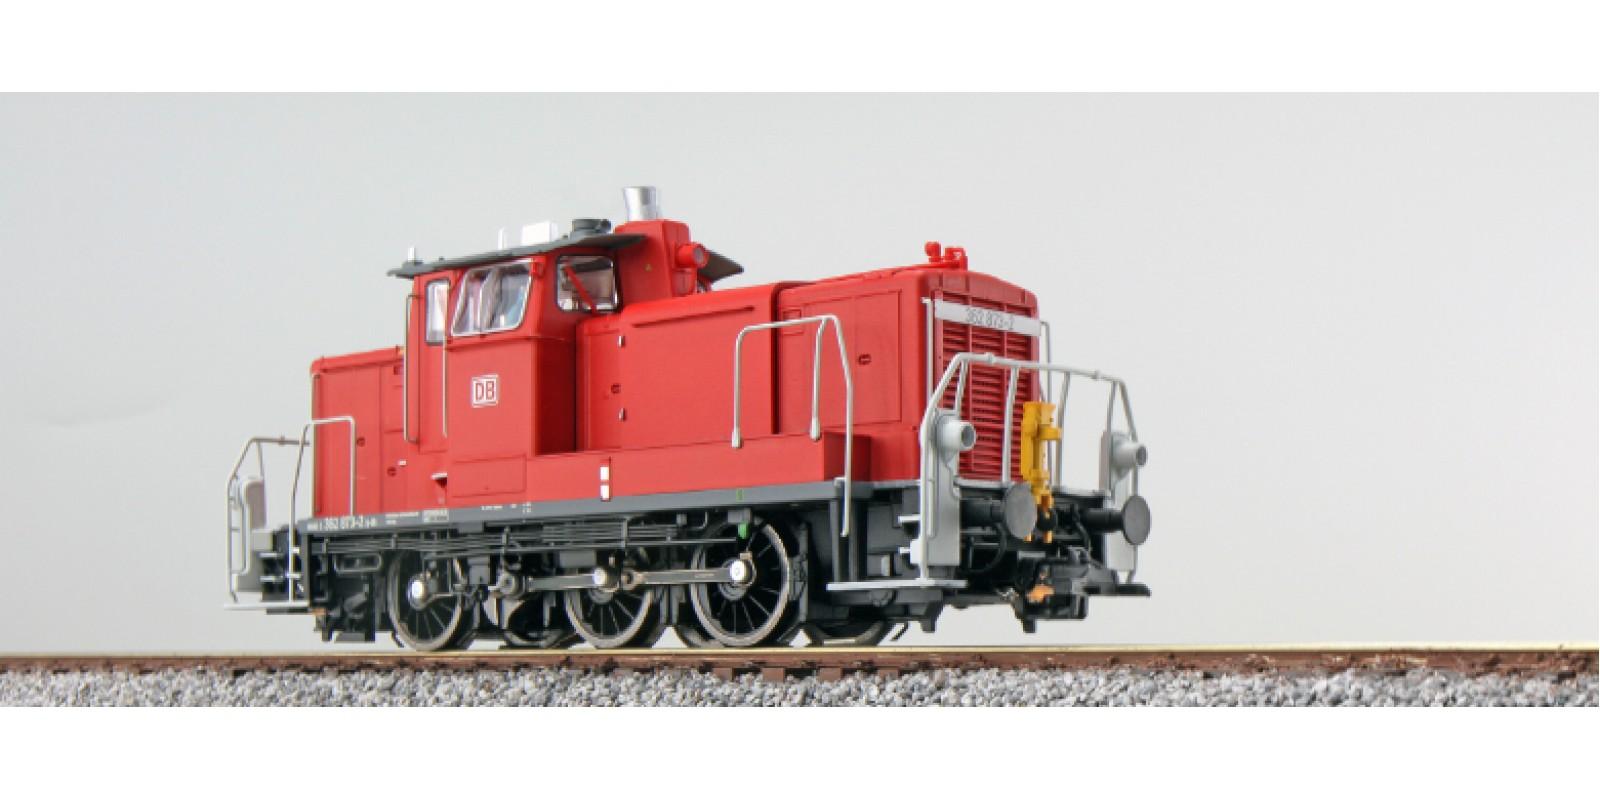 ES31412 Diesel loco, 362 873, traffic red, Era VI, Sound+Smoke, el. Coupler, DC/AC